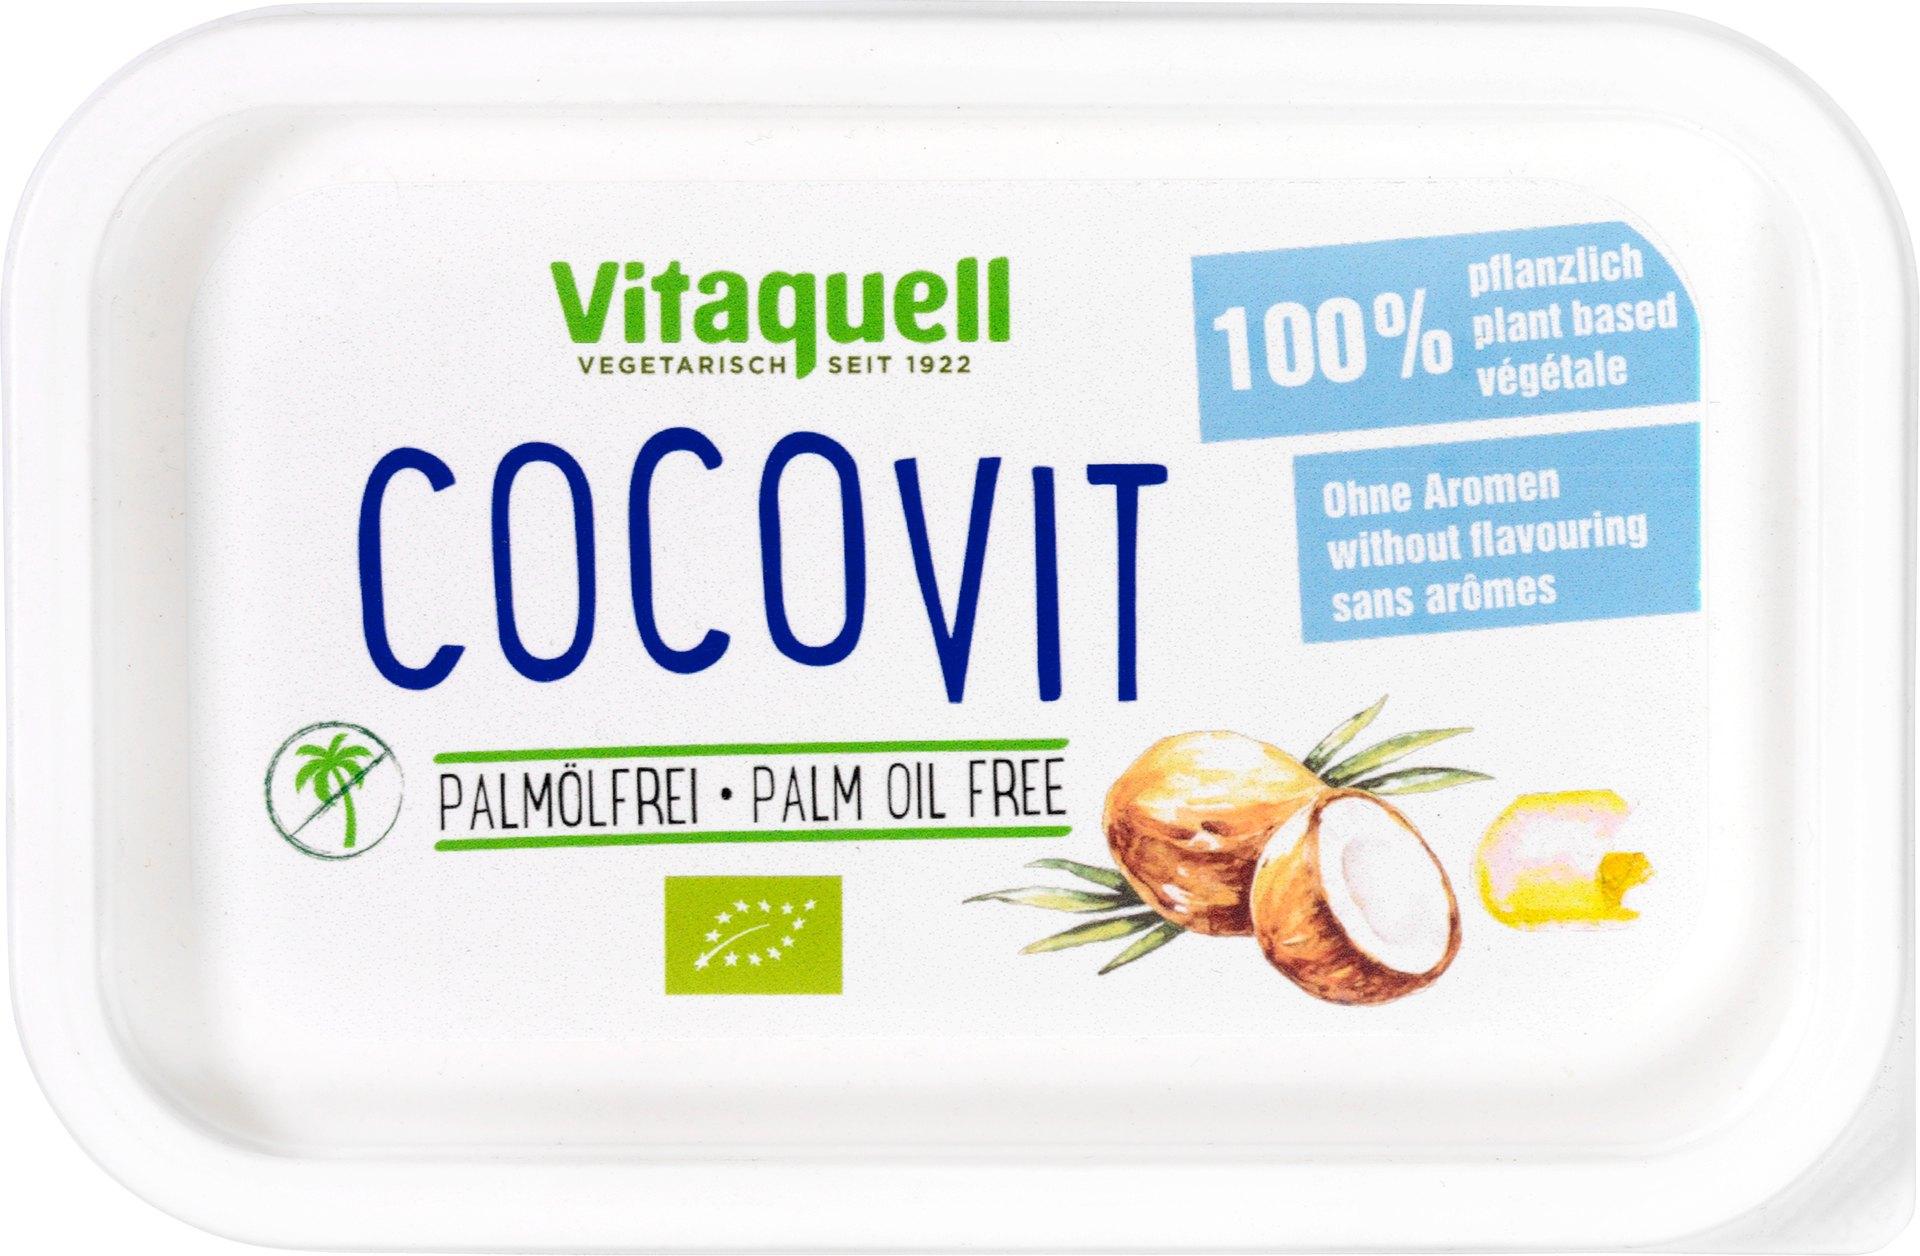 Biologische Vitaquell Cocovit 250 gr